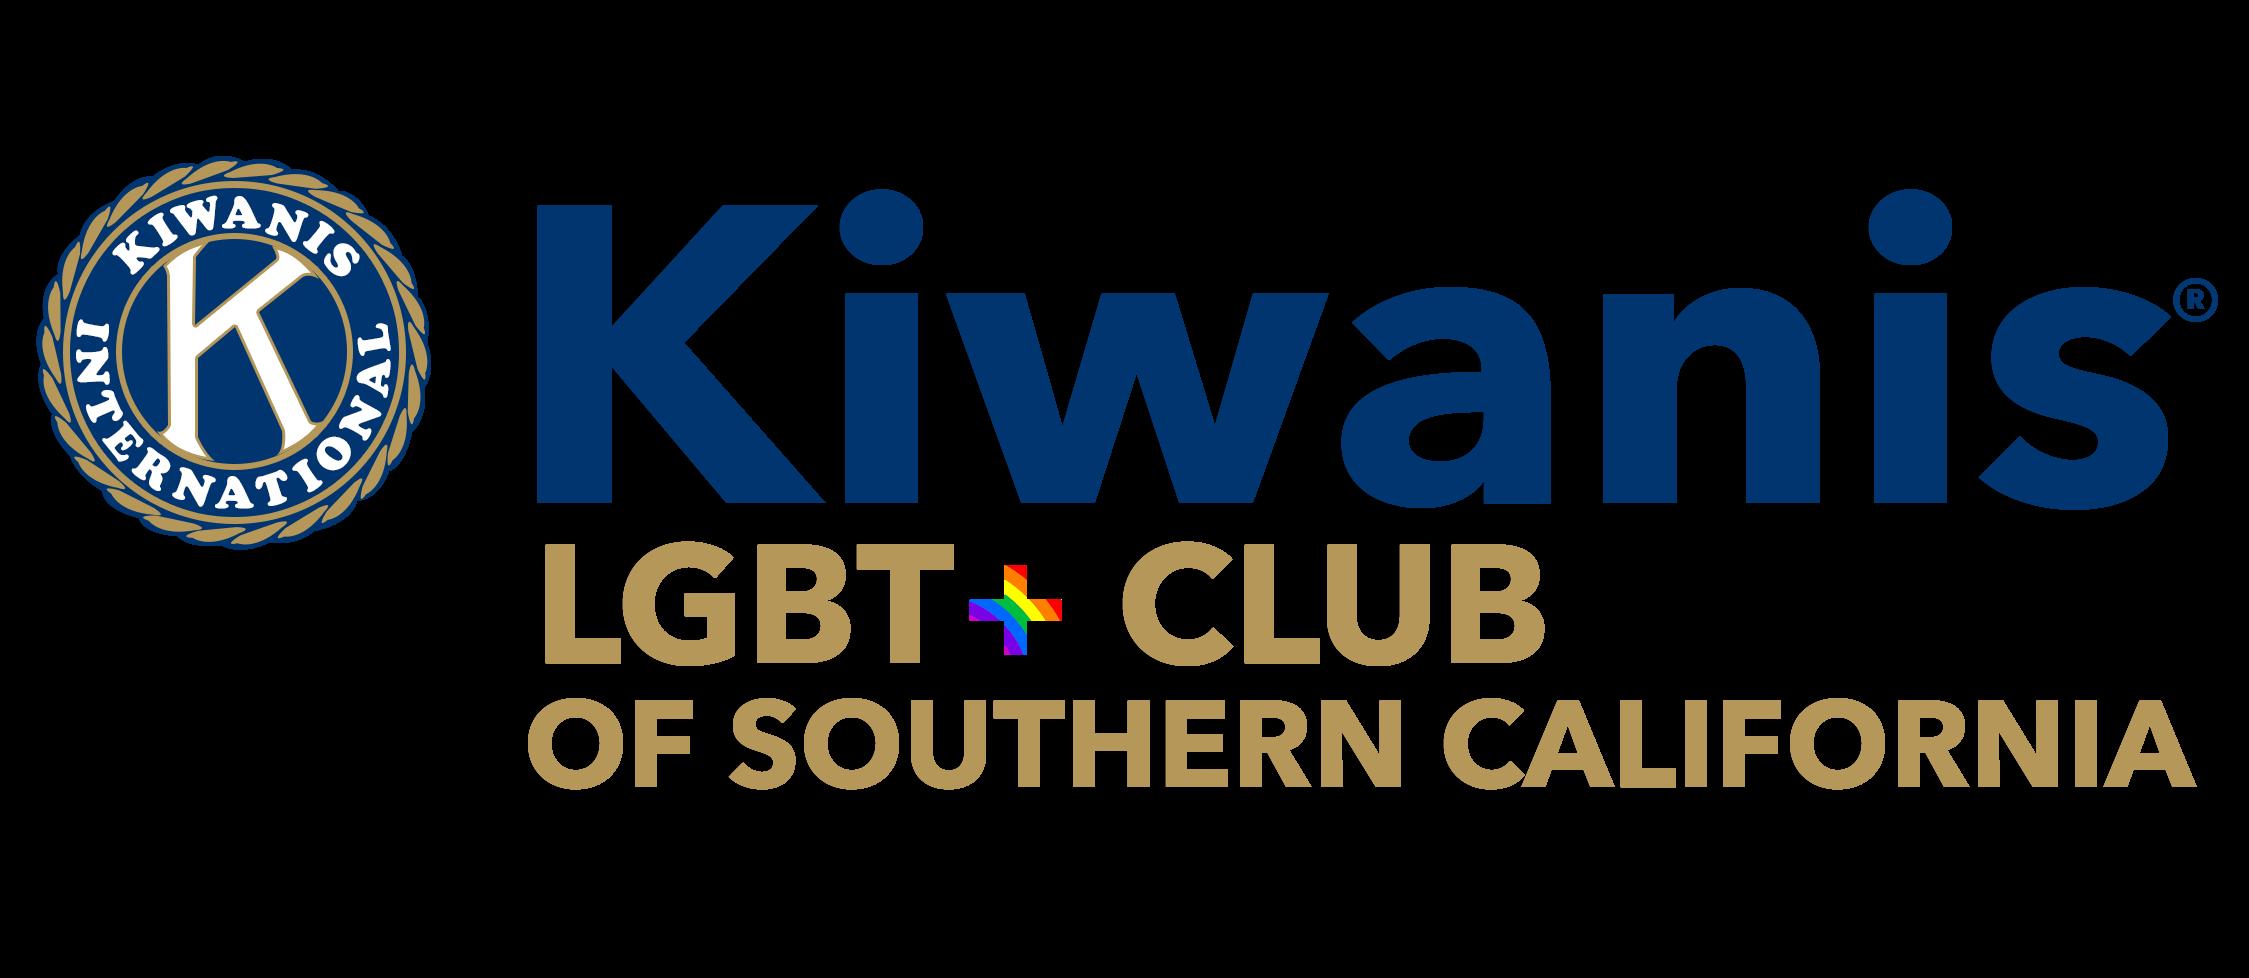 Kiwanis LGBT+ Club of Southern California